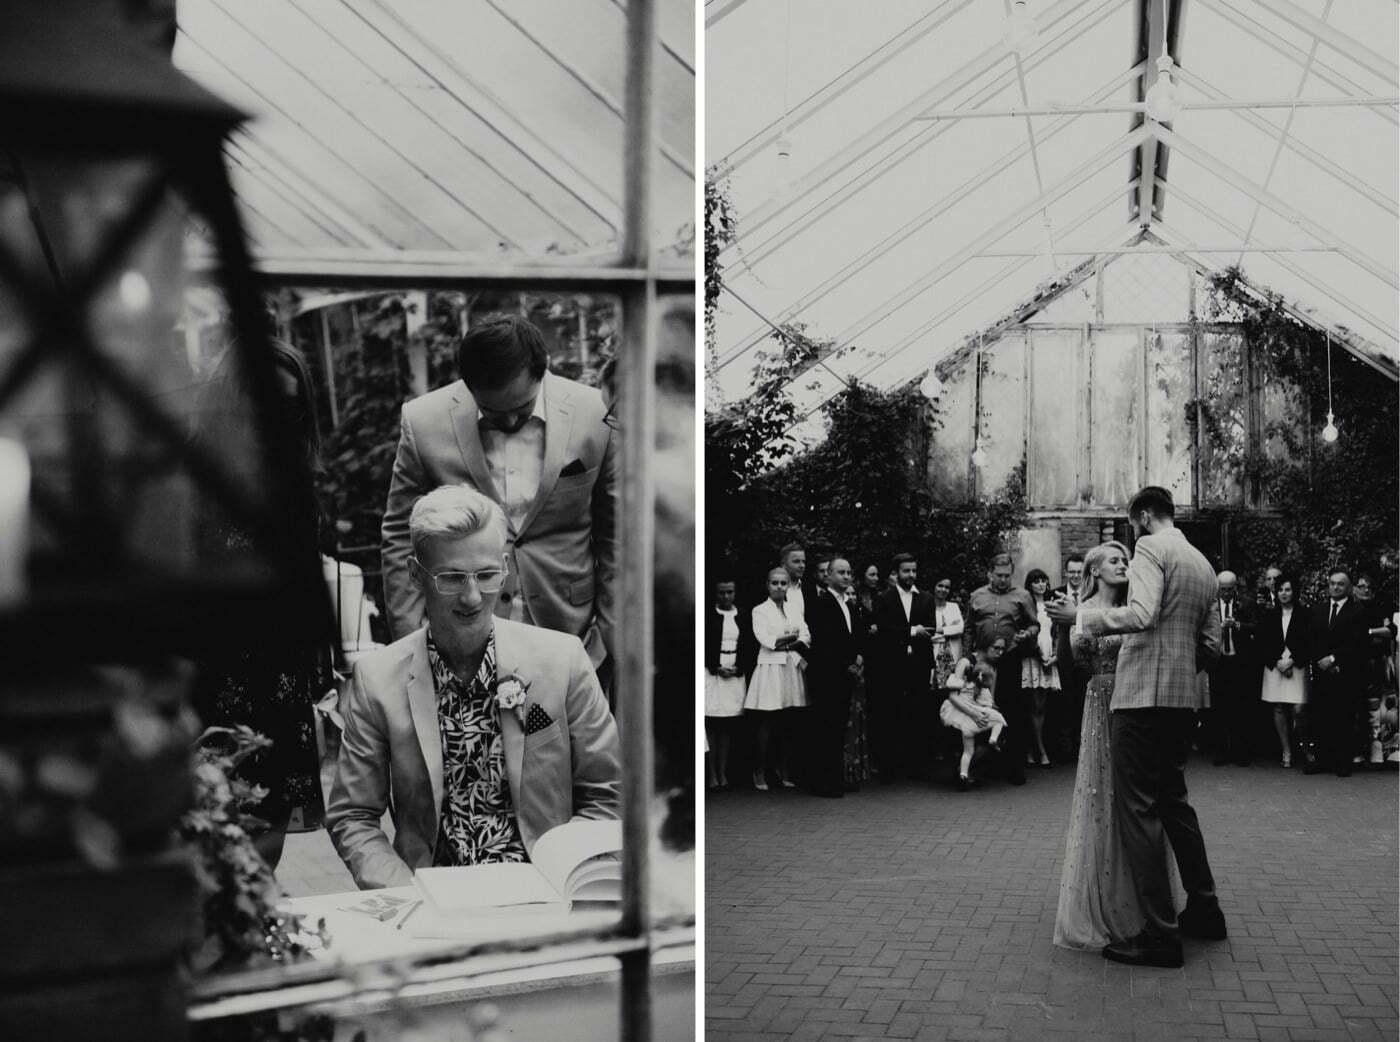 ewelina zieba rustykalne wesele stara oranzeria warszawa 071